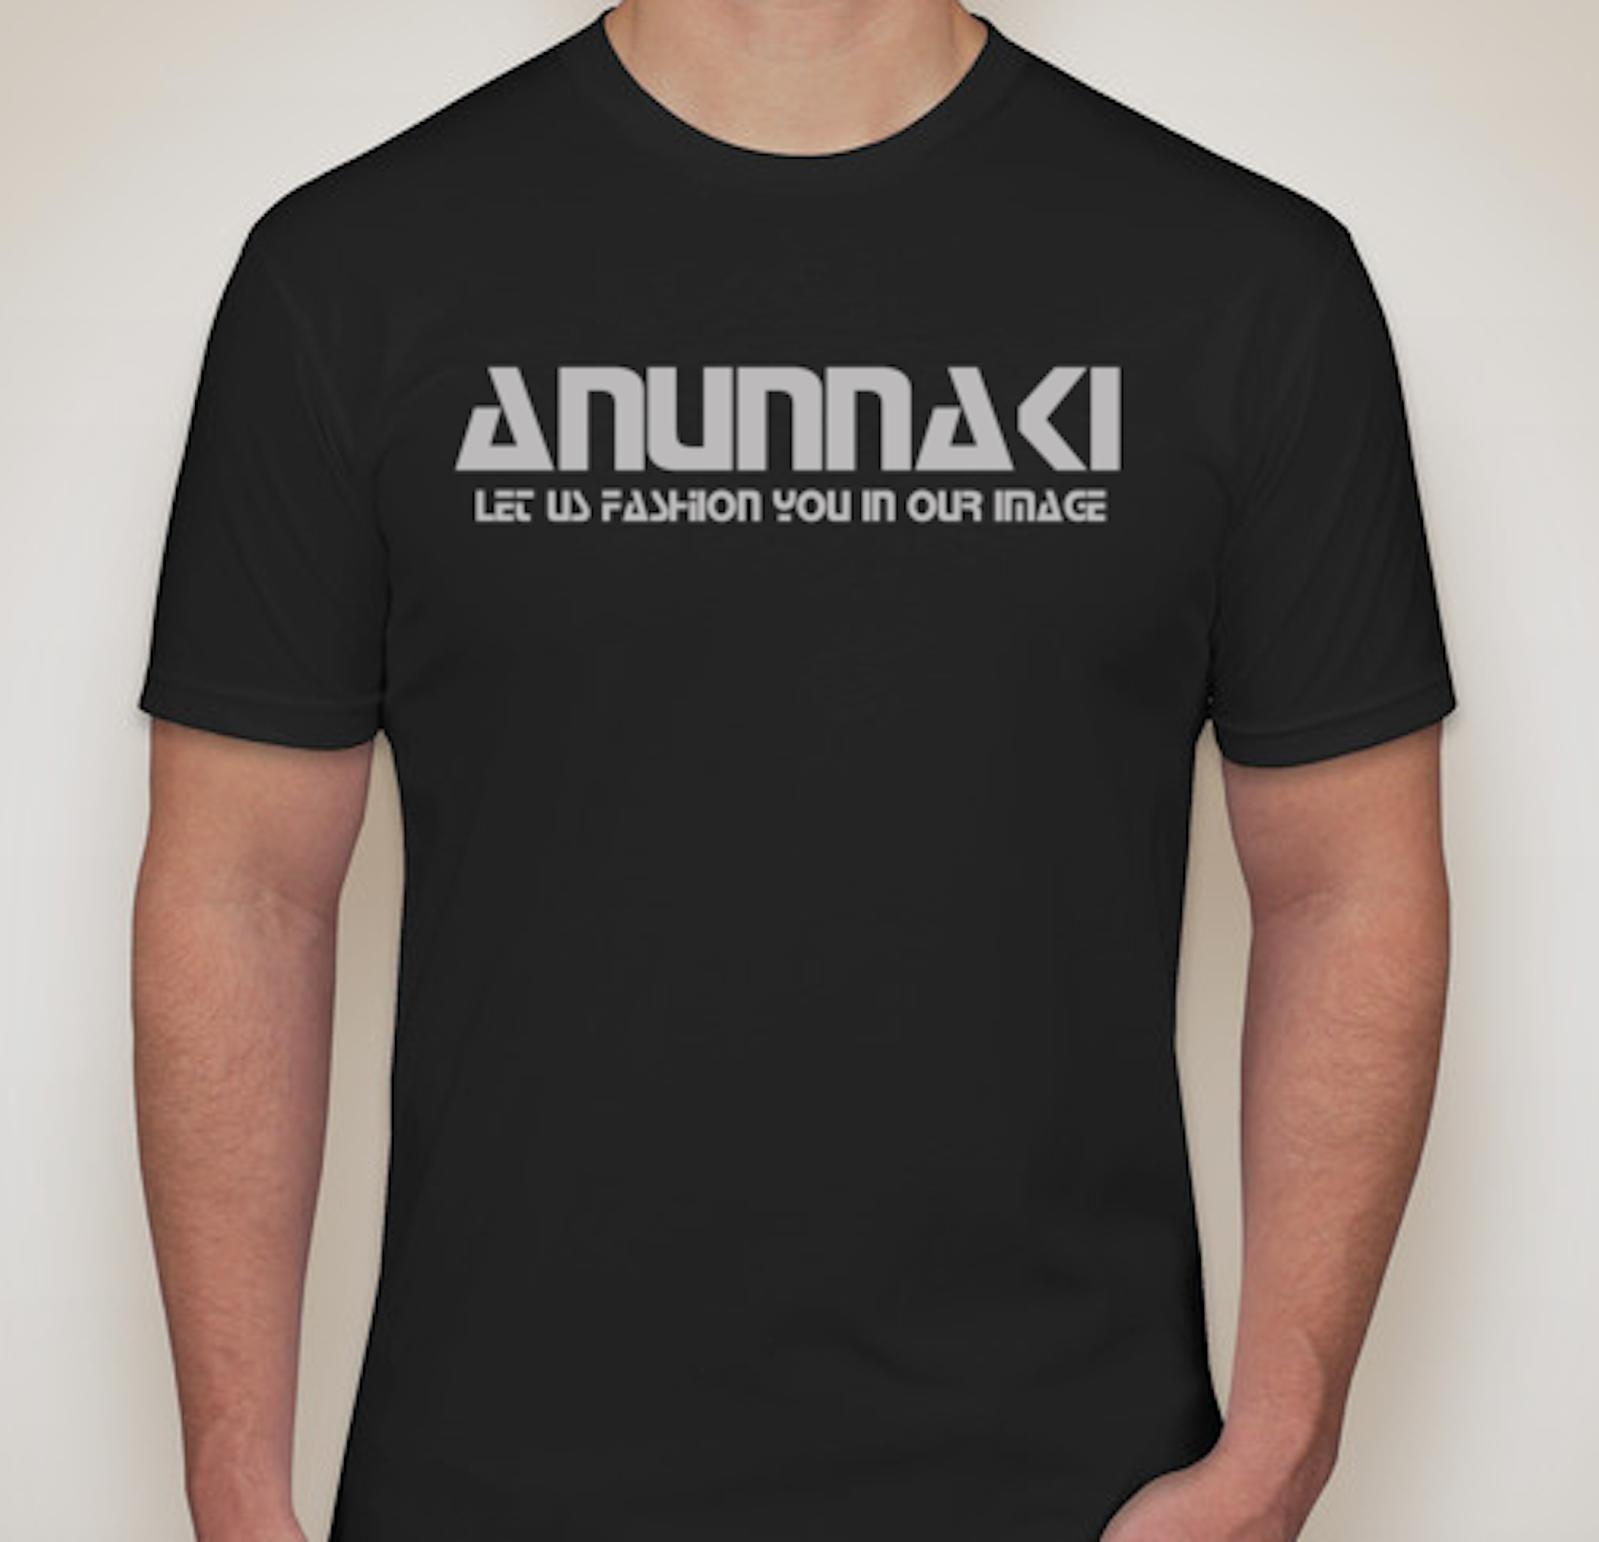 Anunnaki Fashion T-shirt Hot 2019 Summer Men s T Shirt Fashion Male Pre -  Cotton Clothing 100% Cotton 2019 Latest